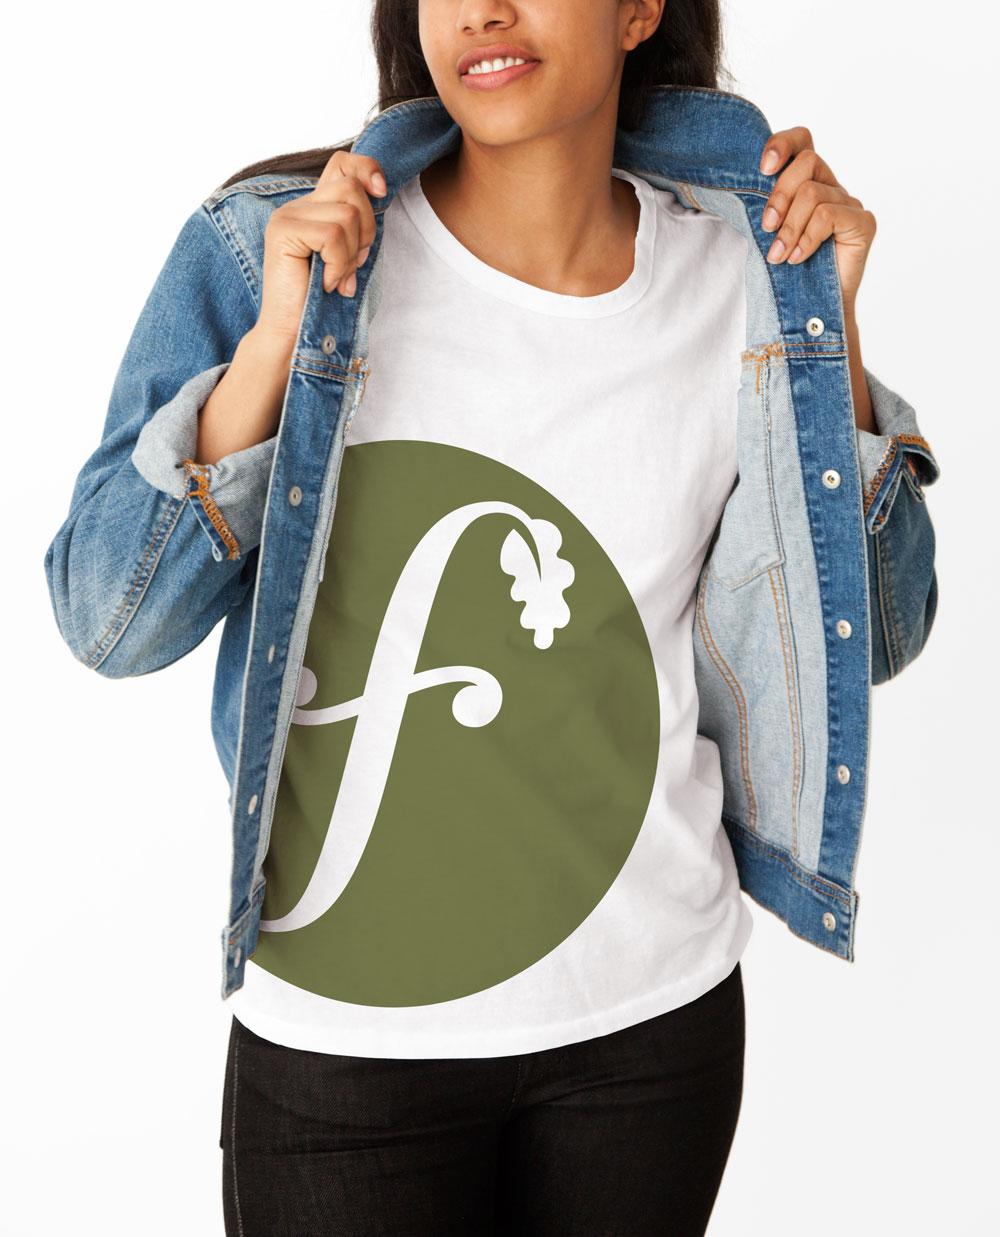 founders-circle-white-tshirt-alternate.jpg